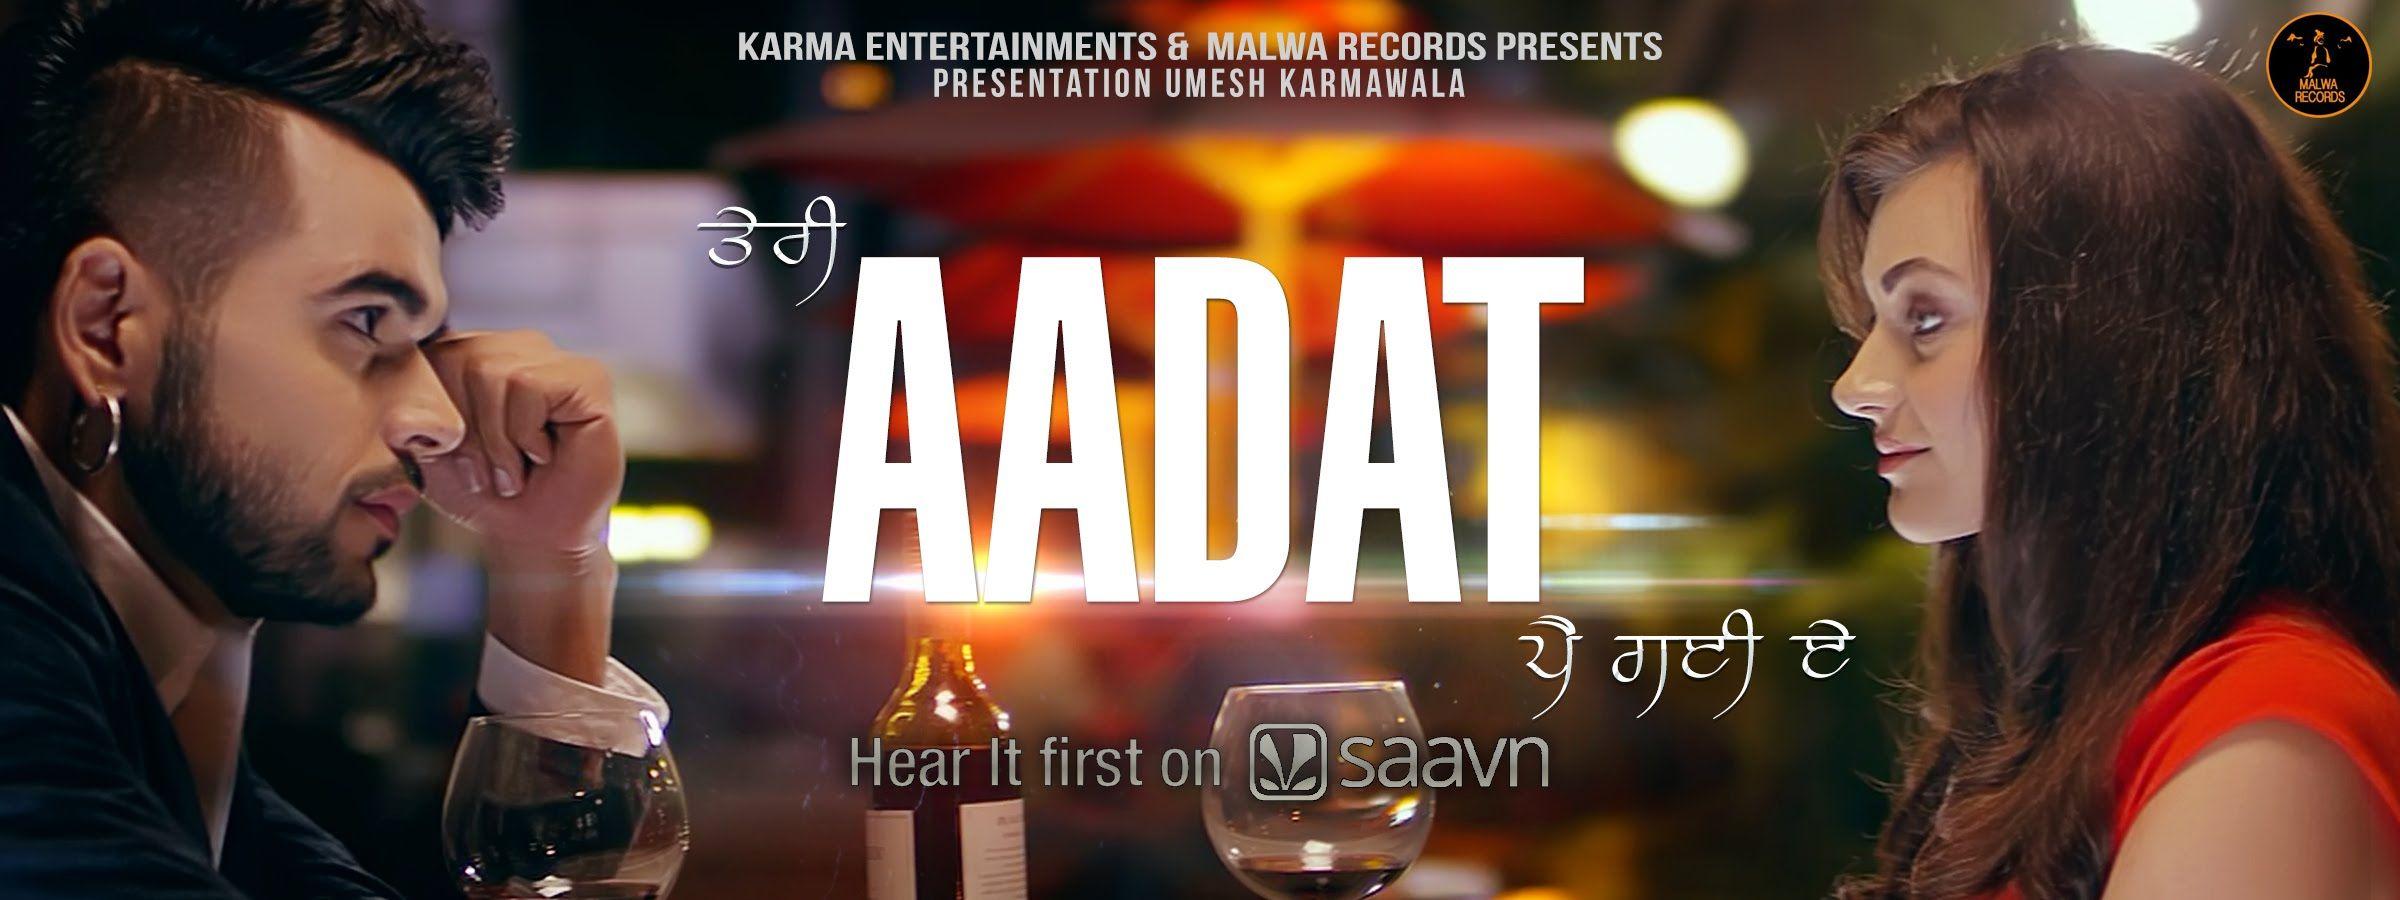 Suit Full HD Punjabi Video Song | Suit Full HD Punjabi Video Song |  Pinterest | Songs